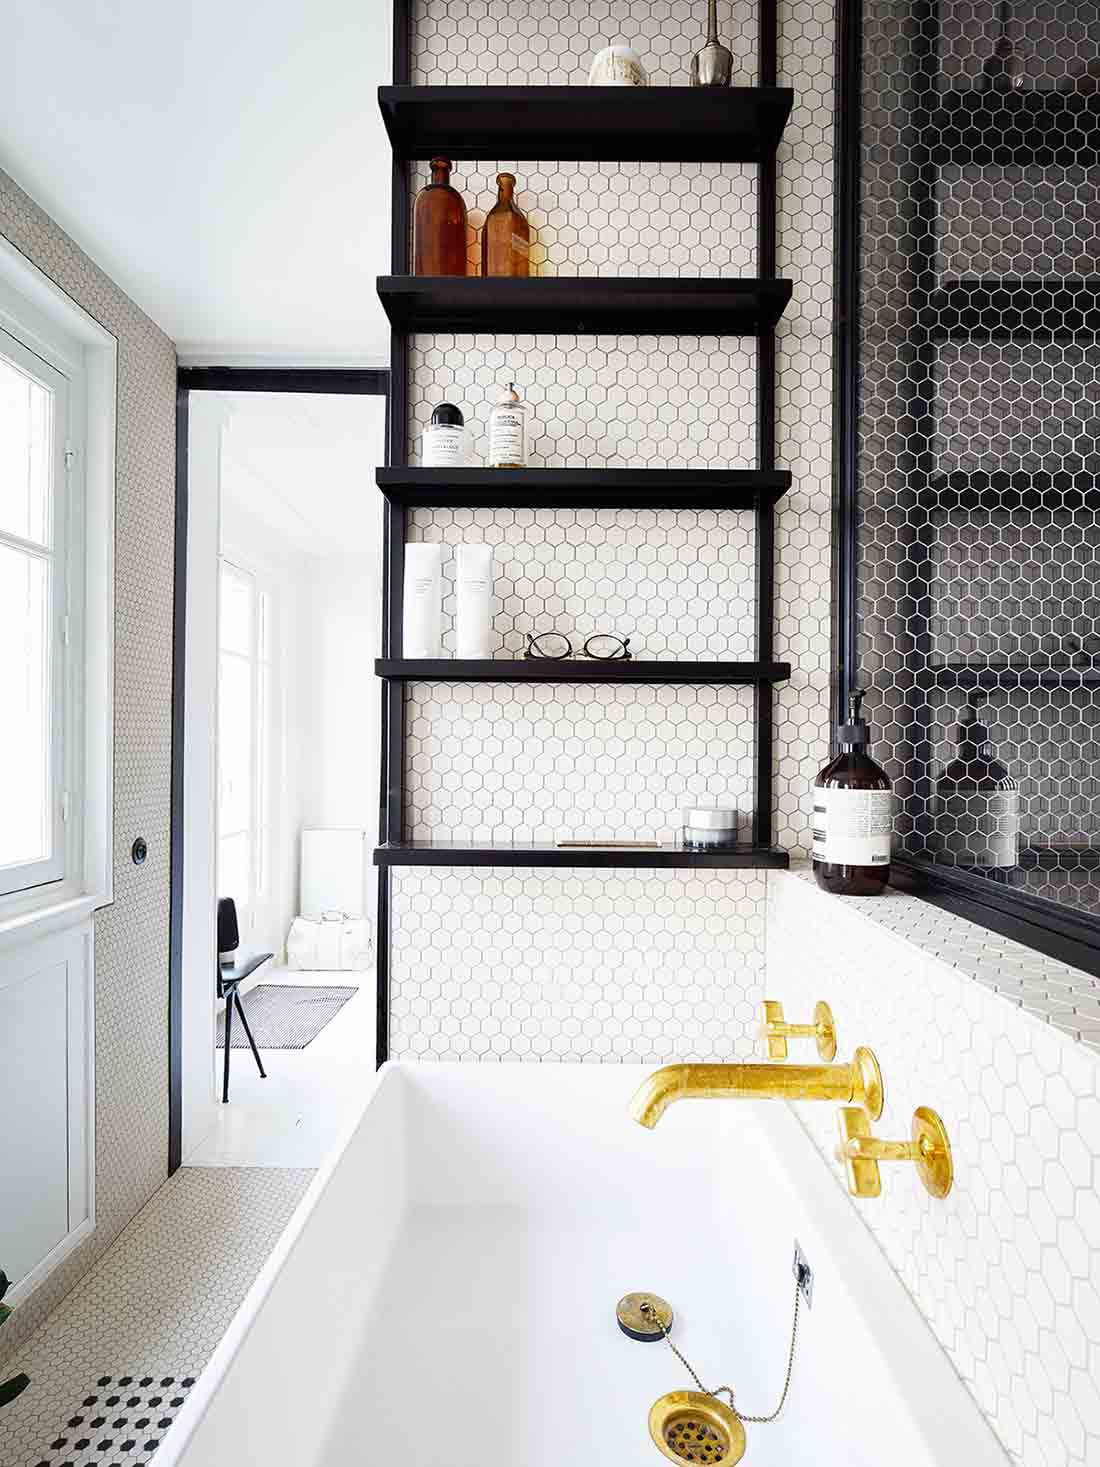 Desain kamar mandi apartemen minimalis karya Septembre Architecture via organized-home.com